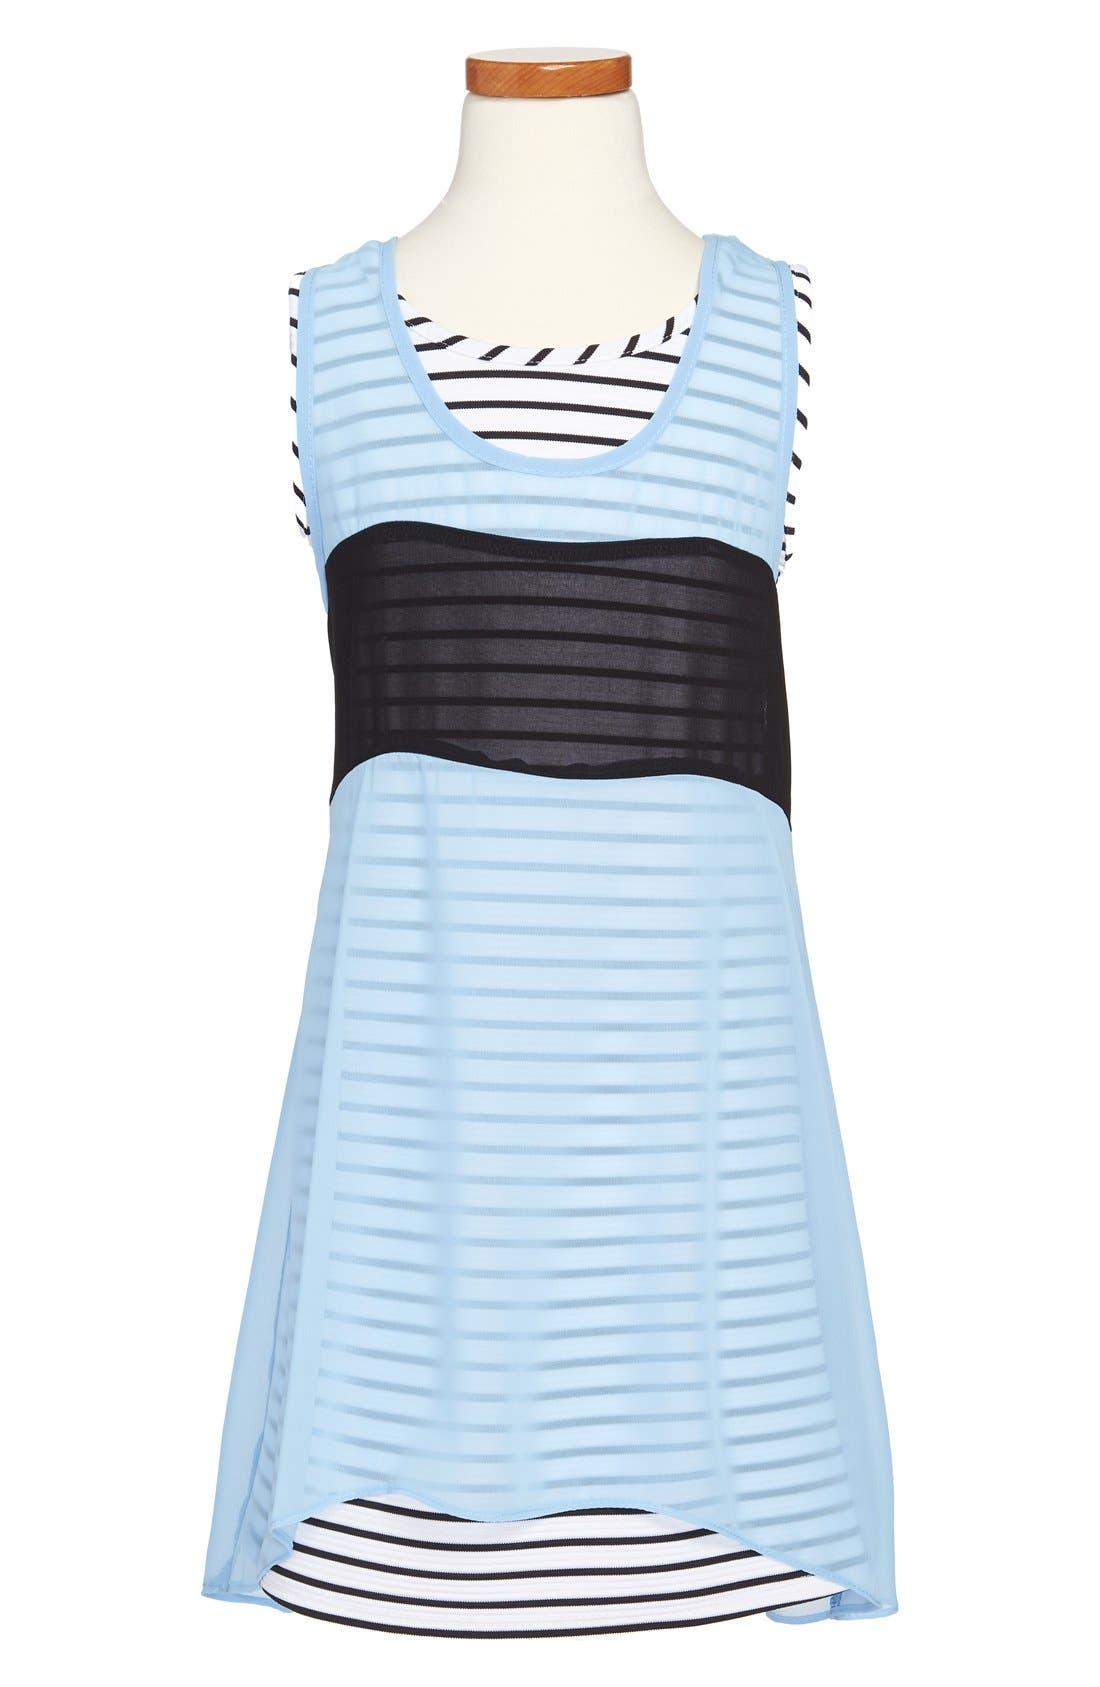 Alternate Image 1 Selected - Sally Miller 'OC' Dress (Big Girls)